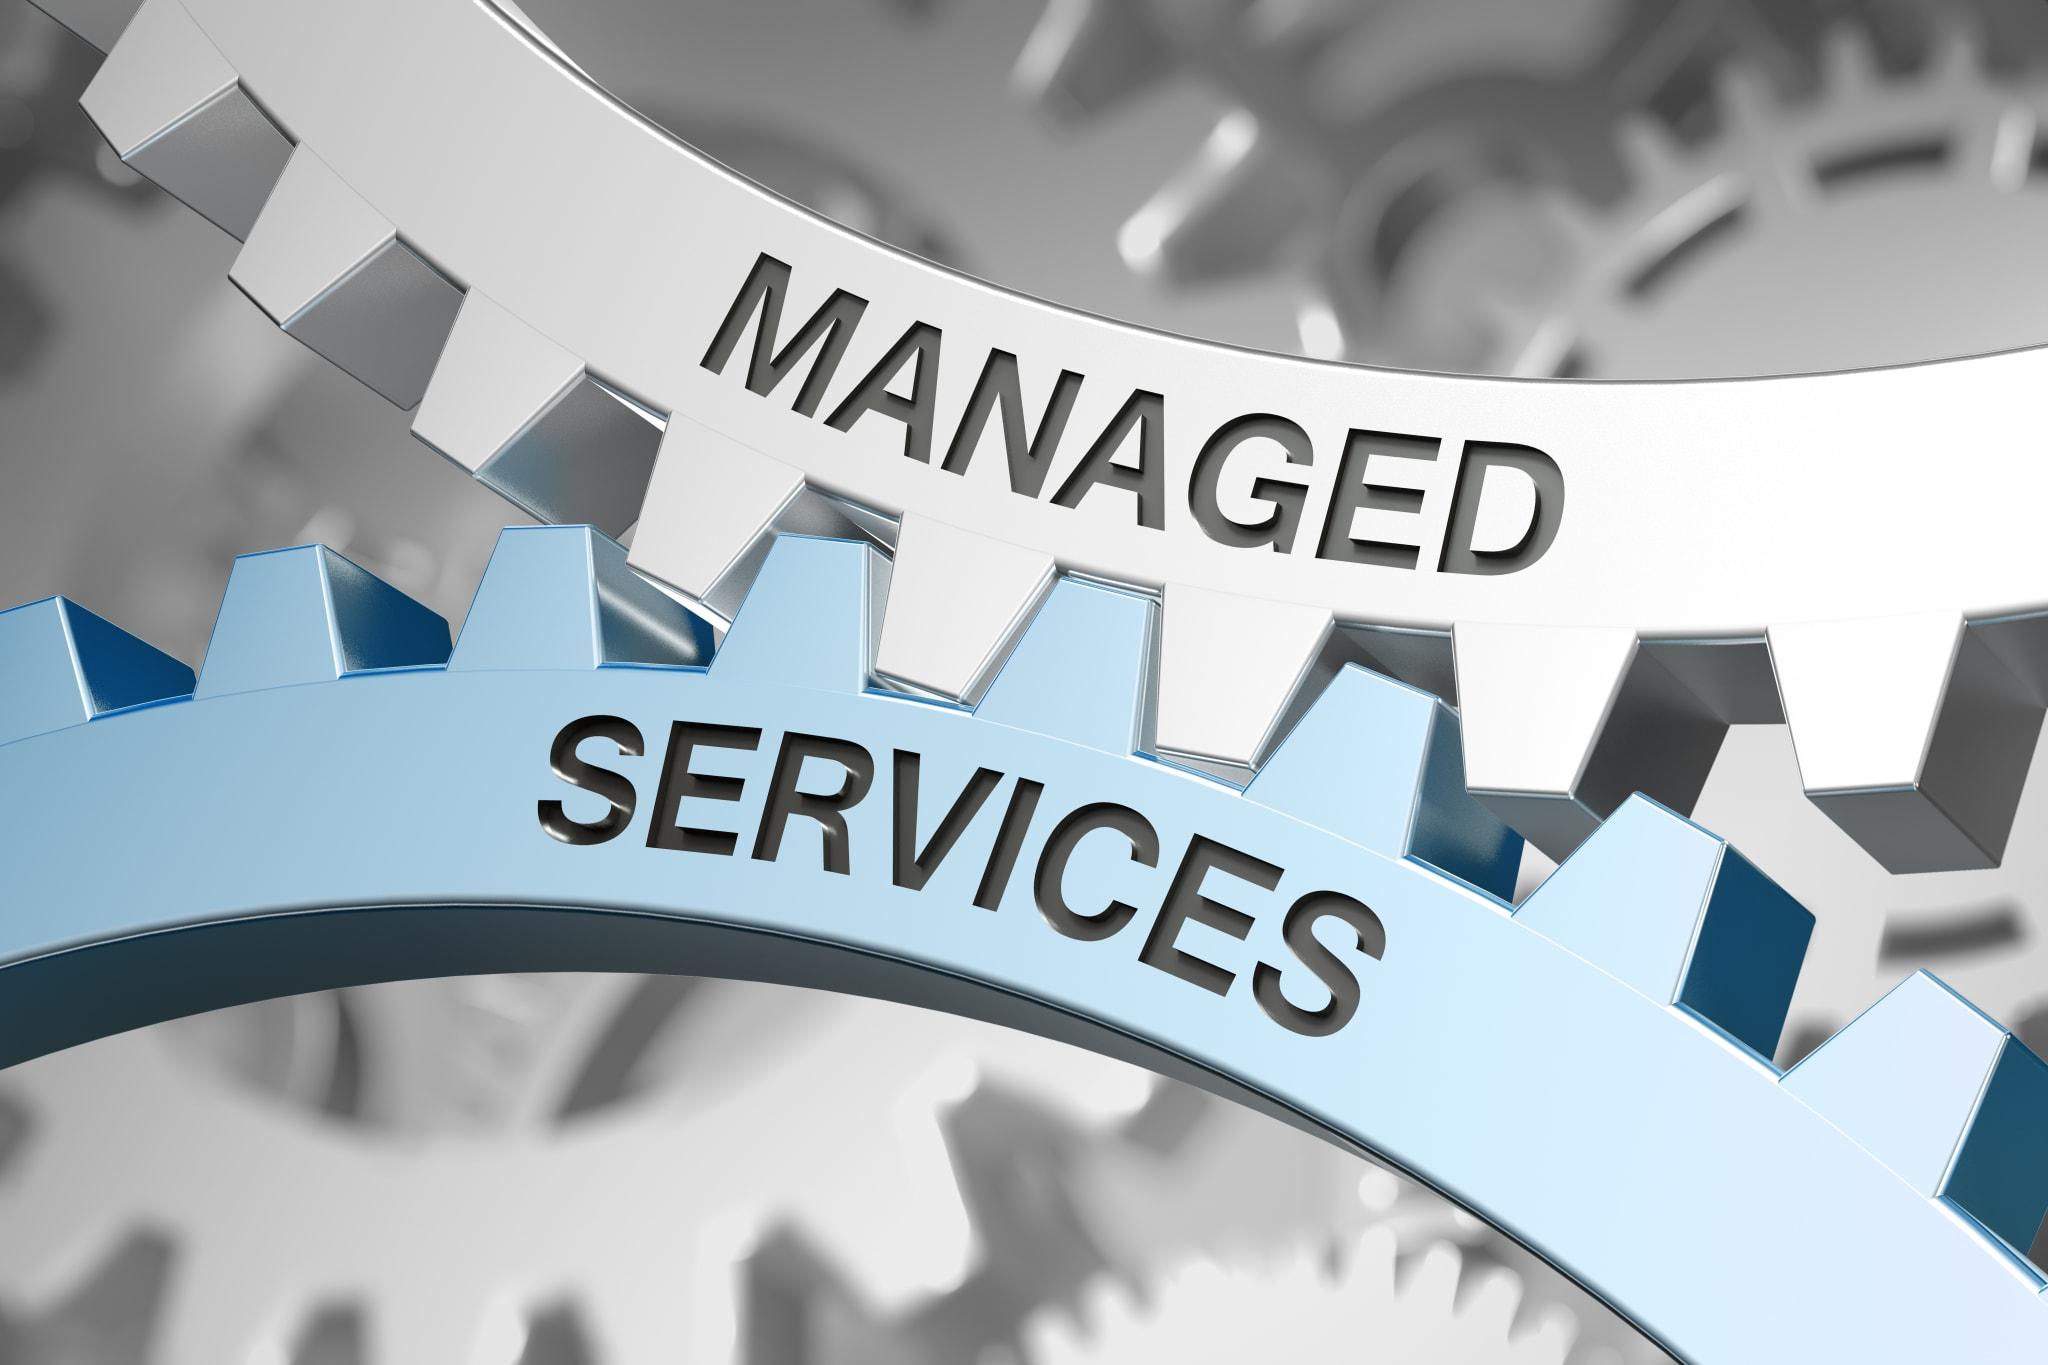 managed service